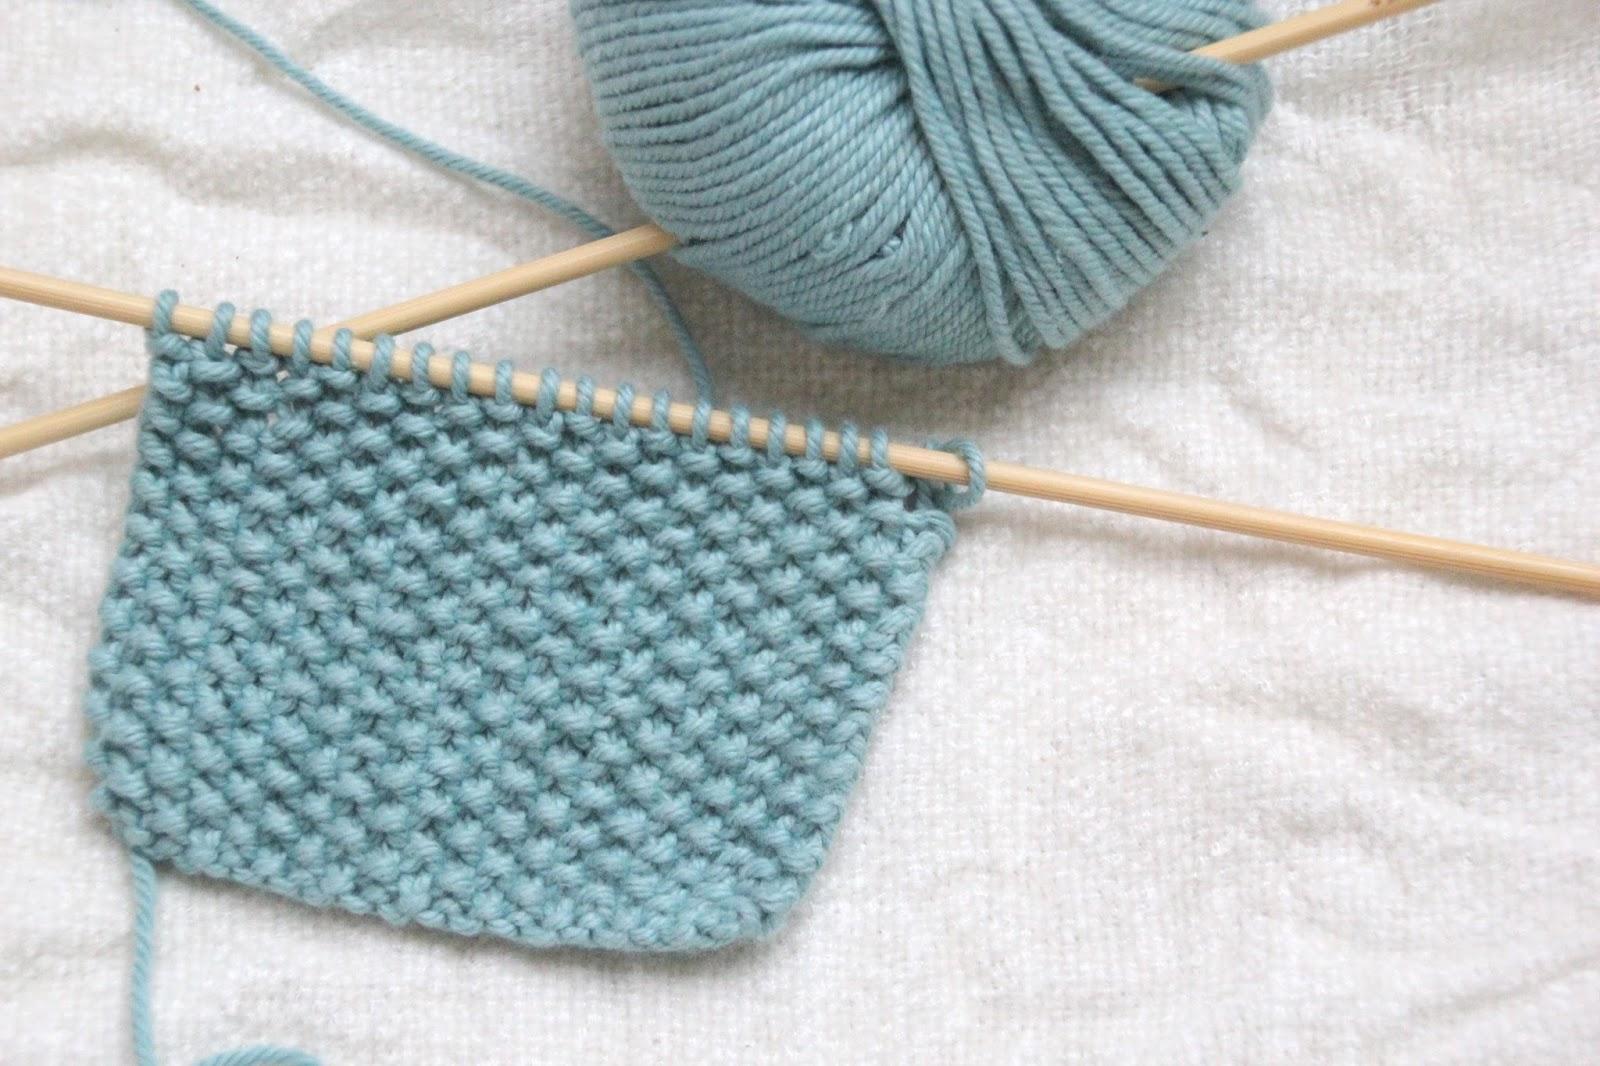 Como aprender a tejer con dos agujas - Tipos puntos dos agujas ...